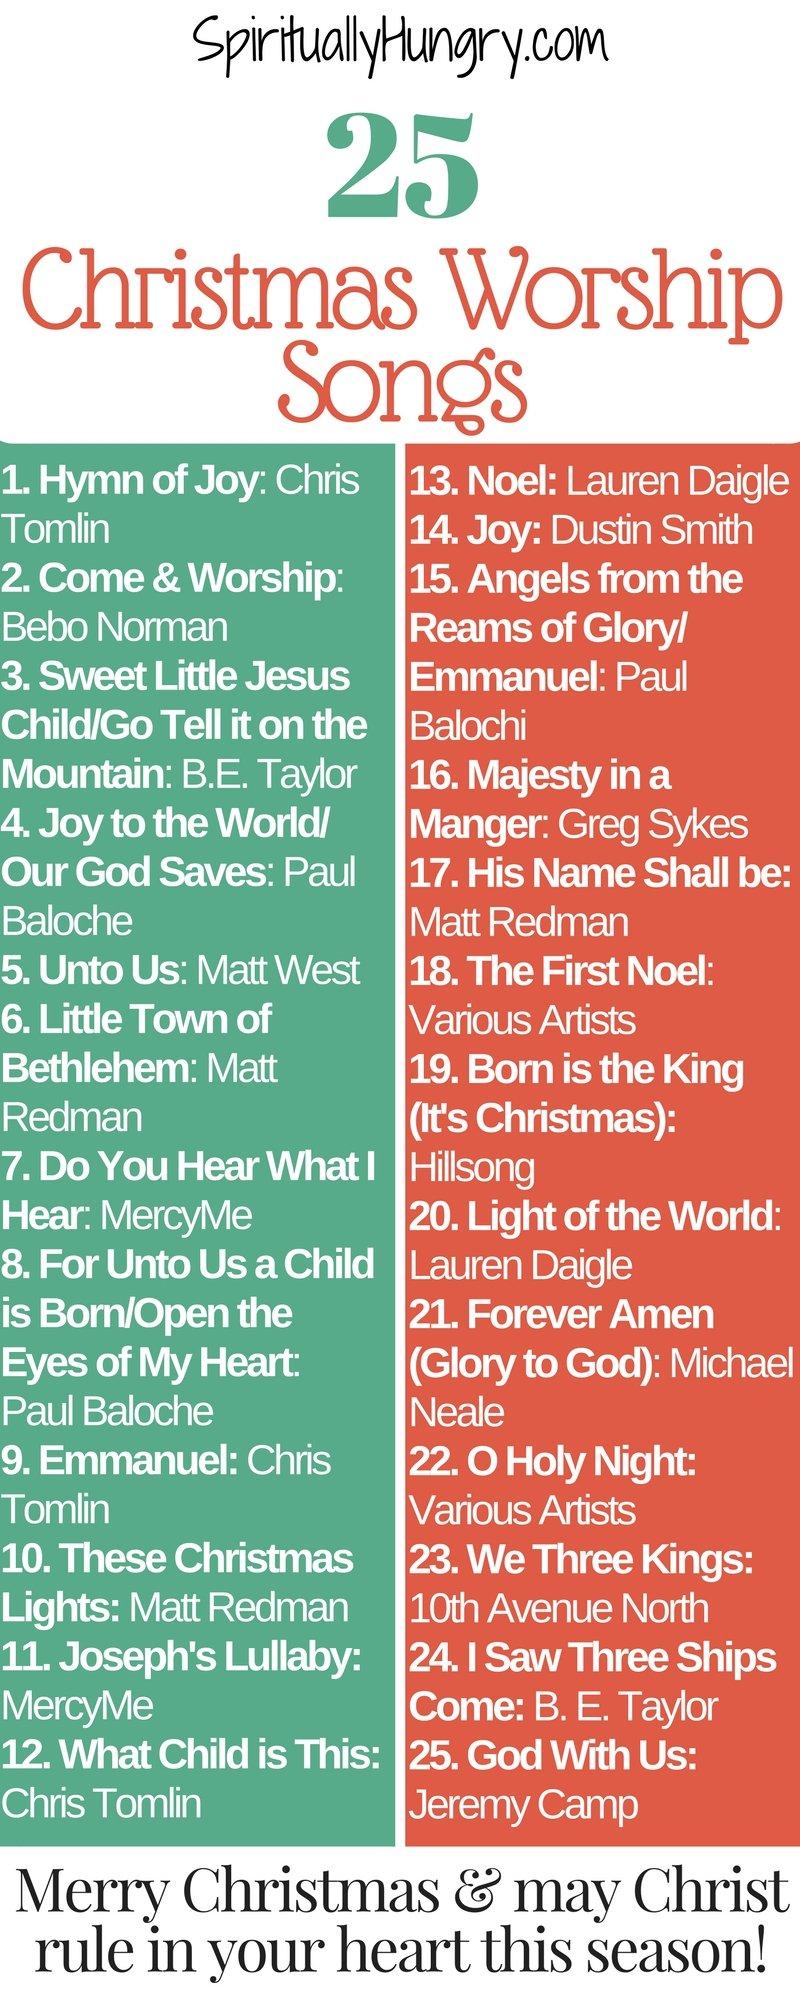 The 31 Day December Joy Challenge - Spiritually Hungry